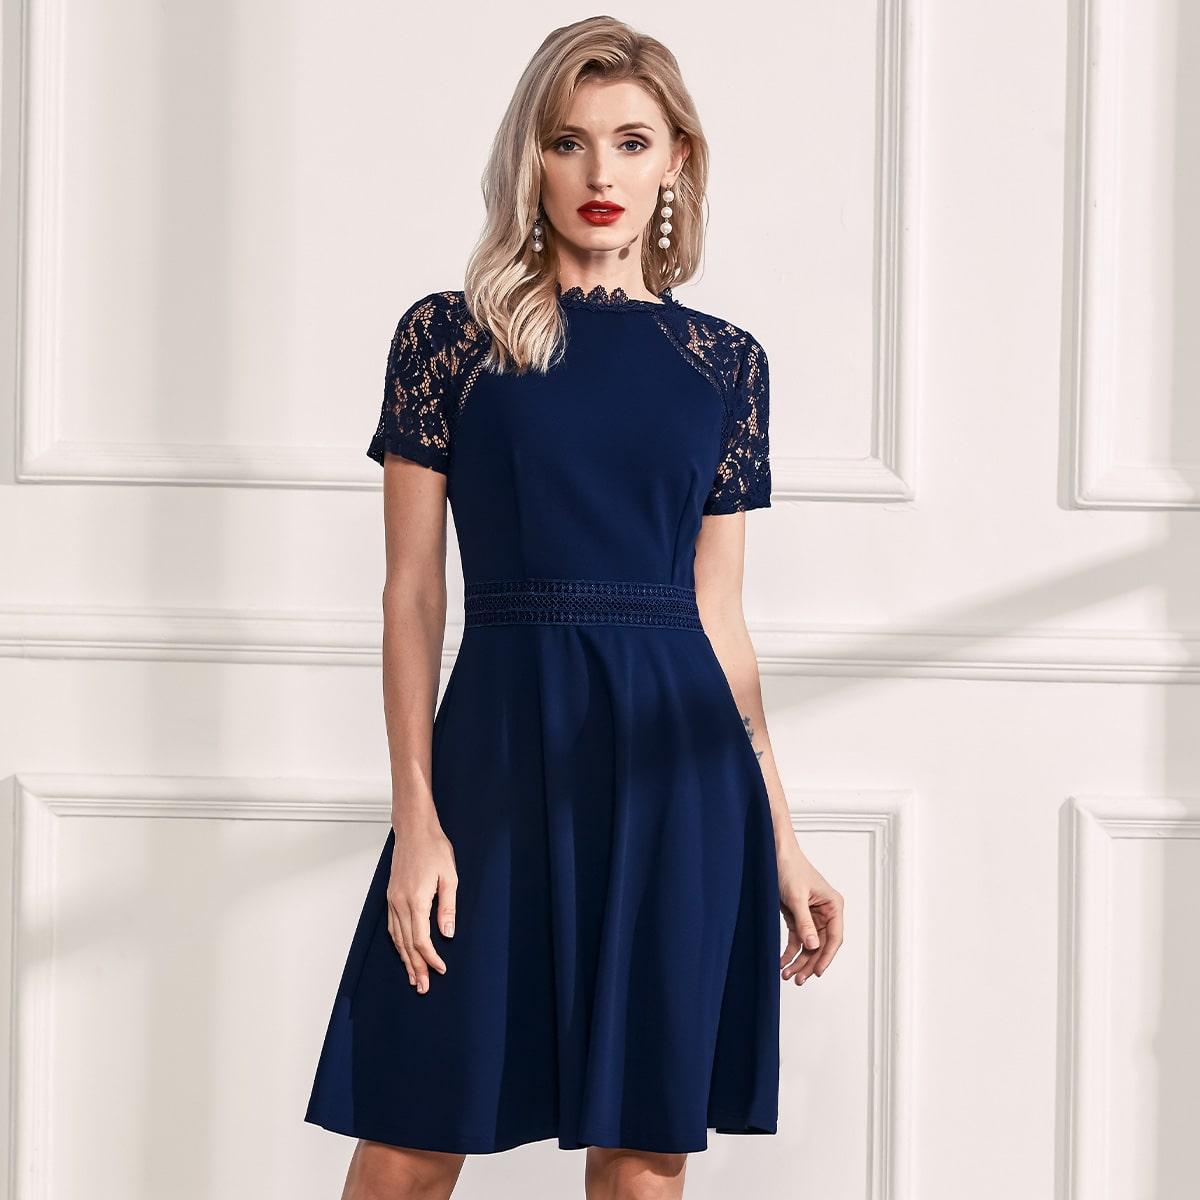 Lace Insert Raglan Sleeve Skater Dress